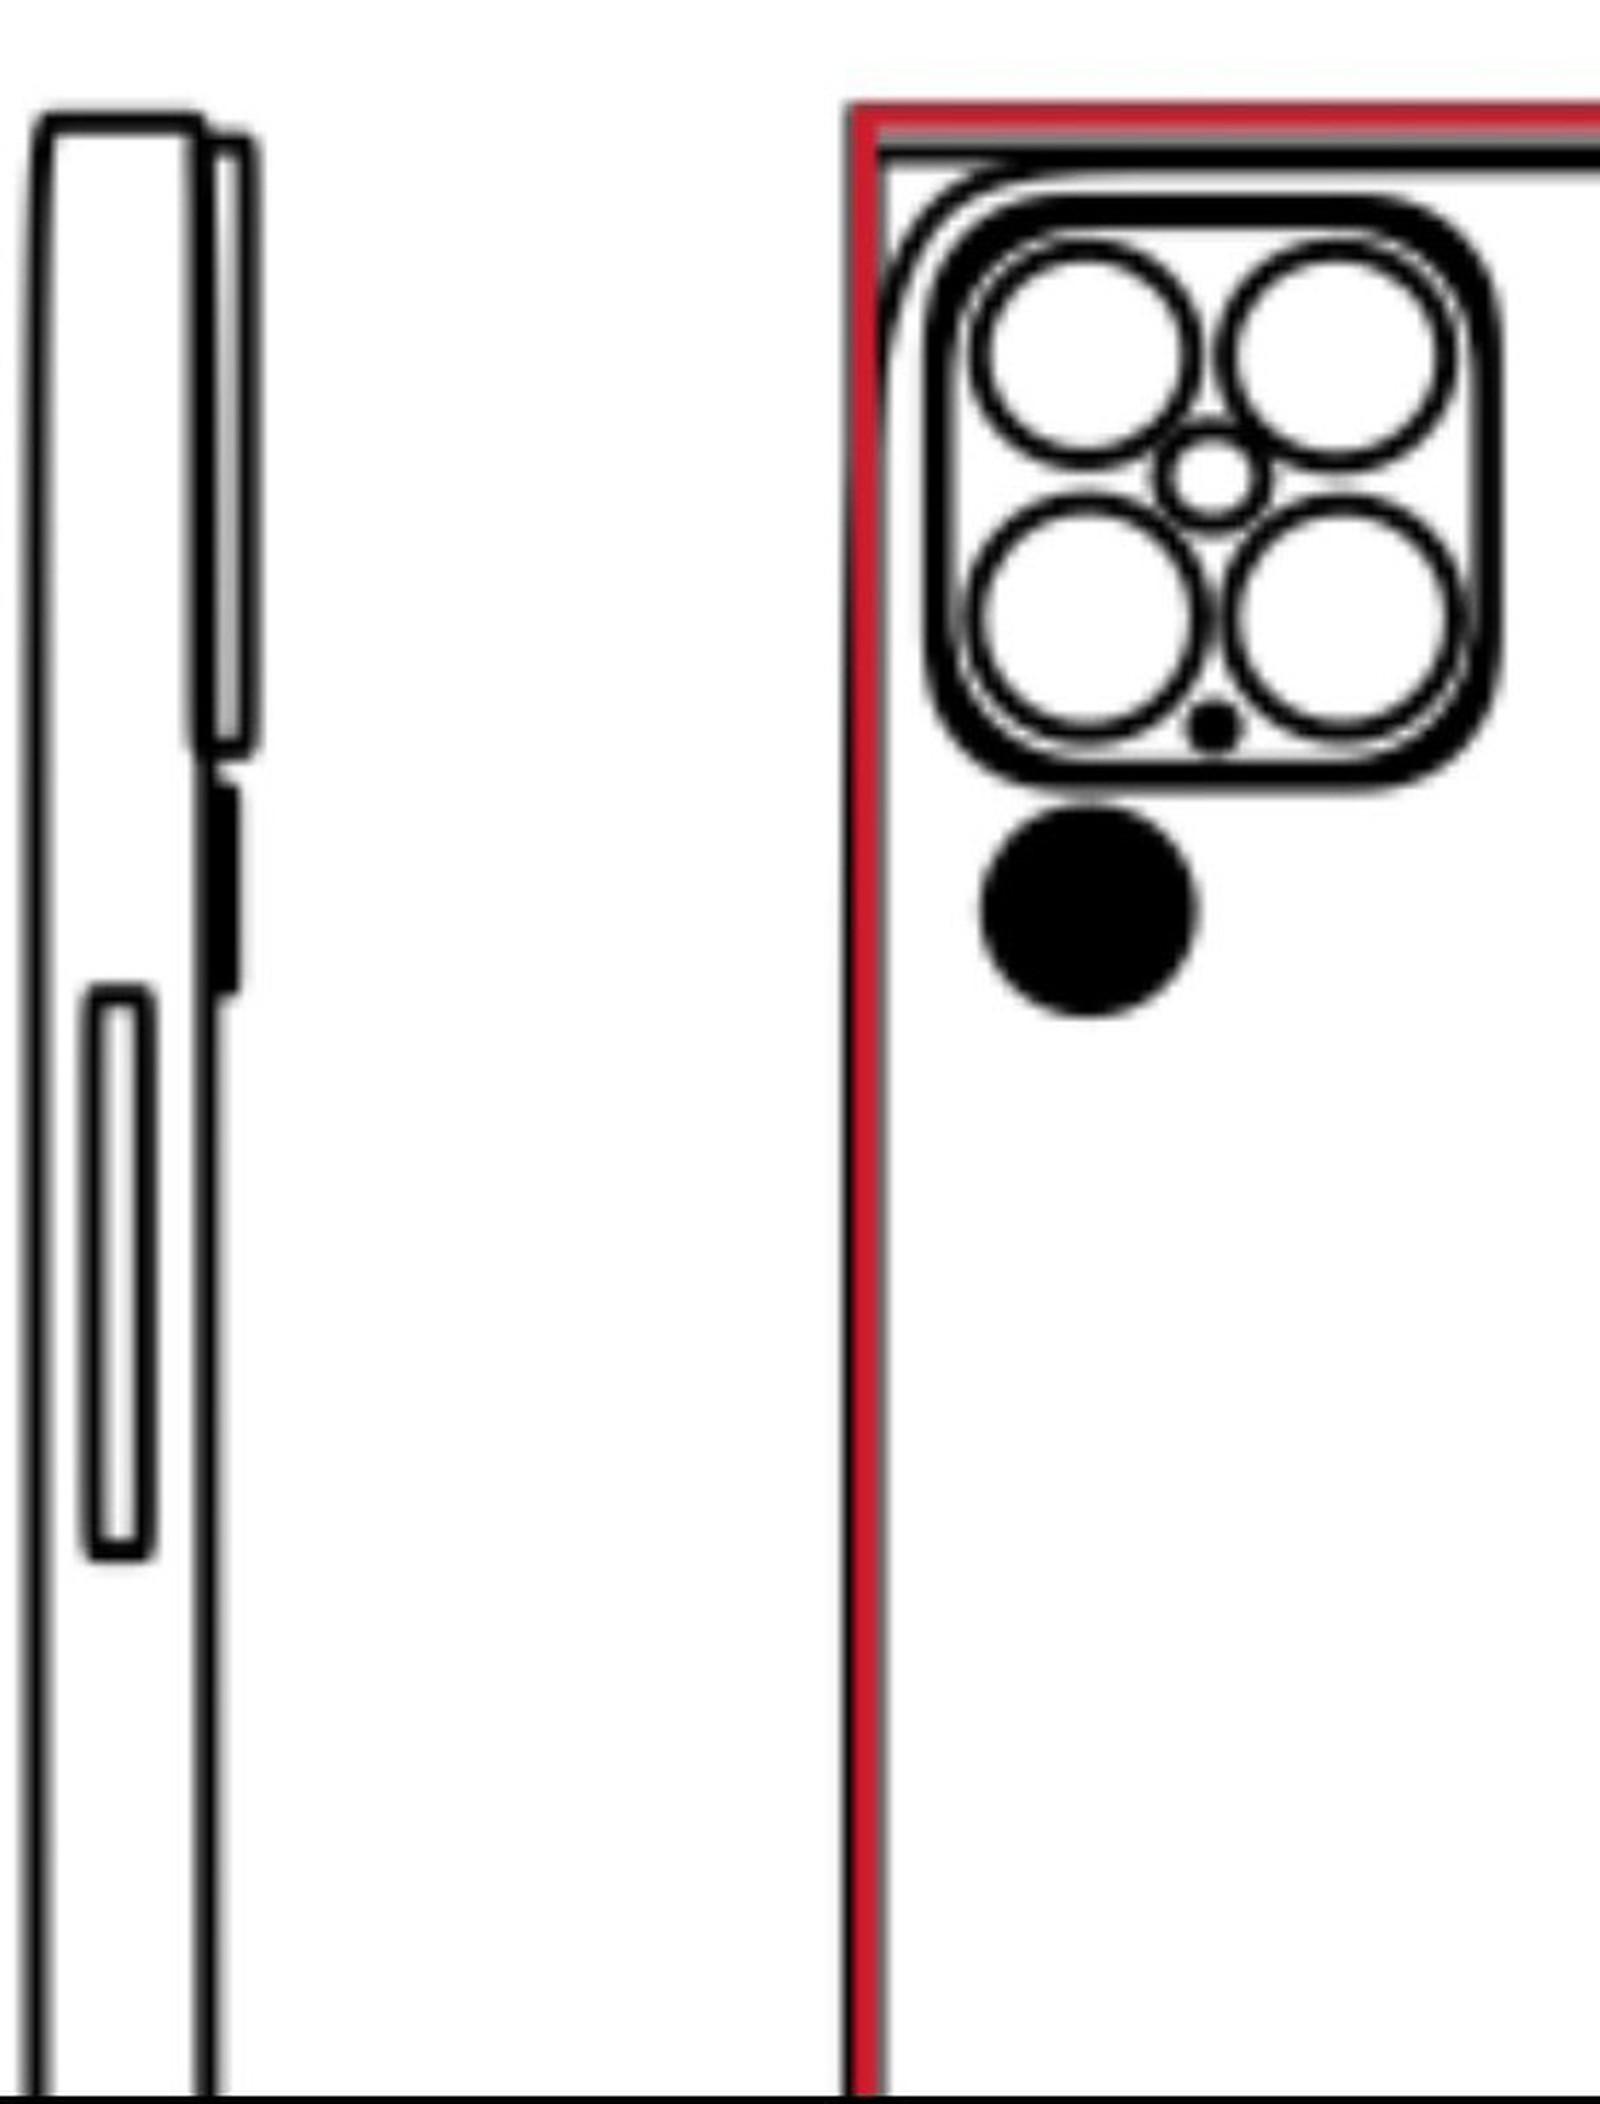 Nákres iPhonu 13